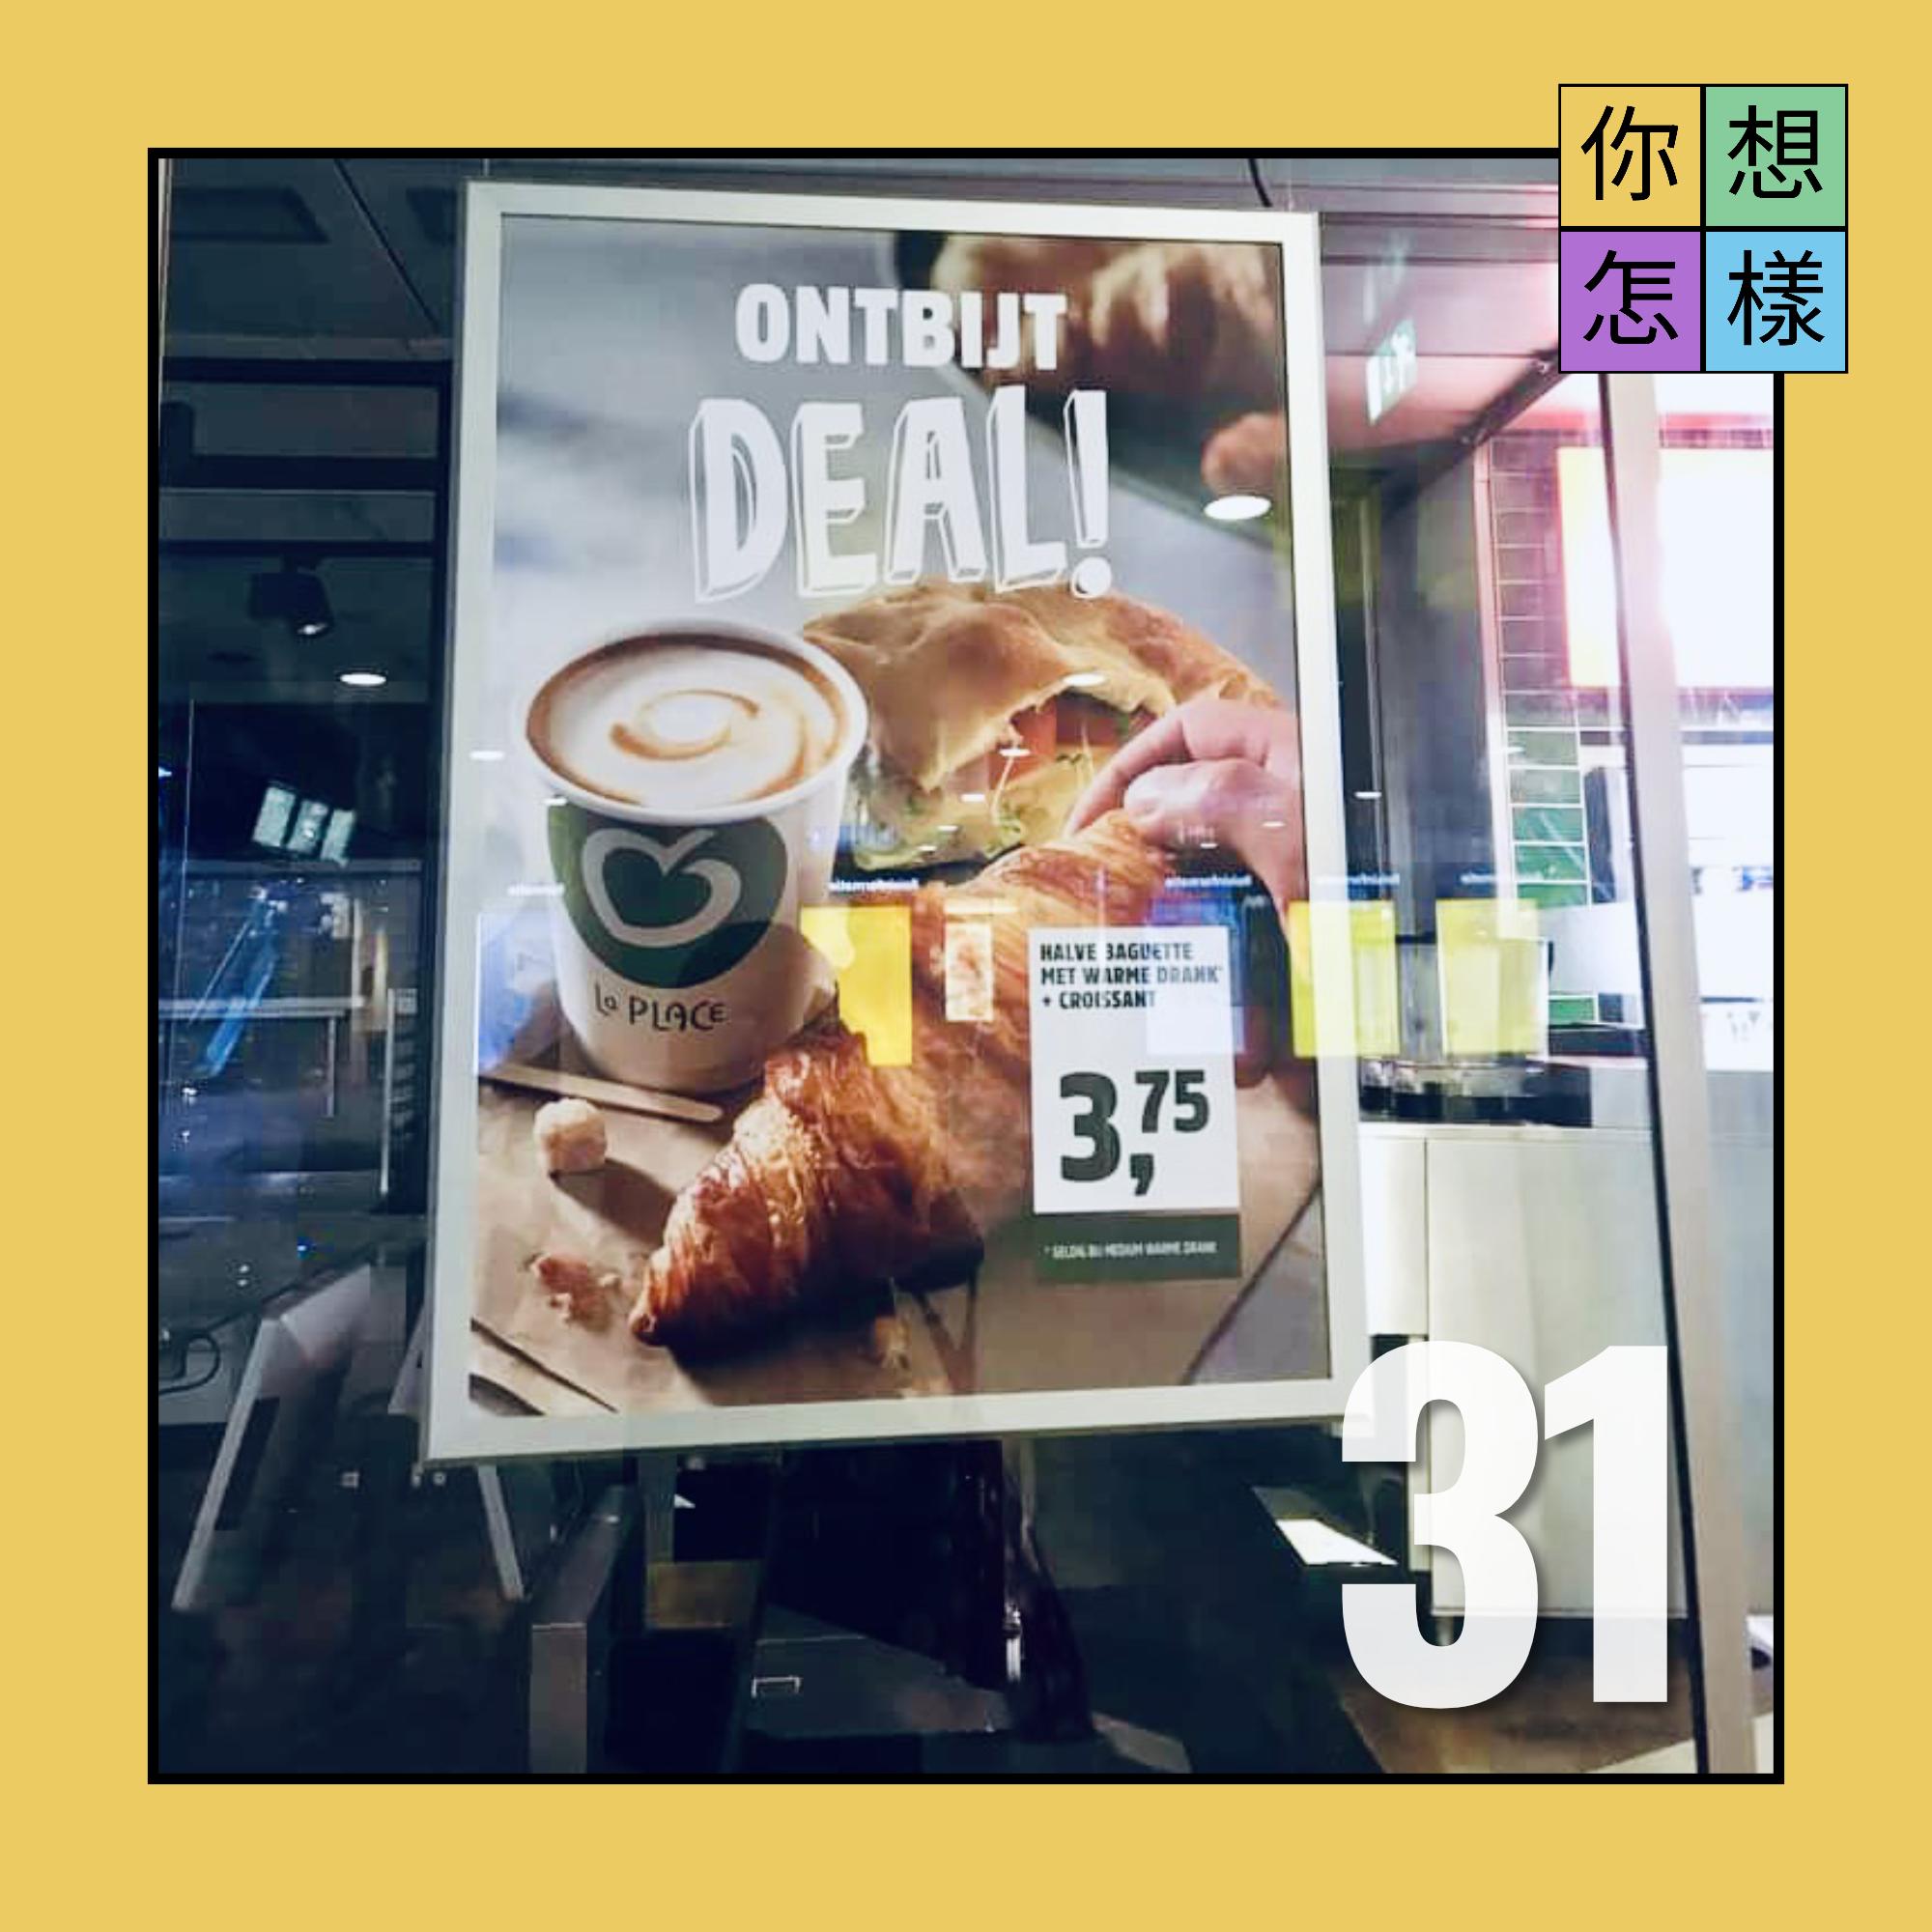 Episode 31 - 荷蘭省錢!去博物館上廁所就是王道!(Feat. 史巴小資女)